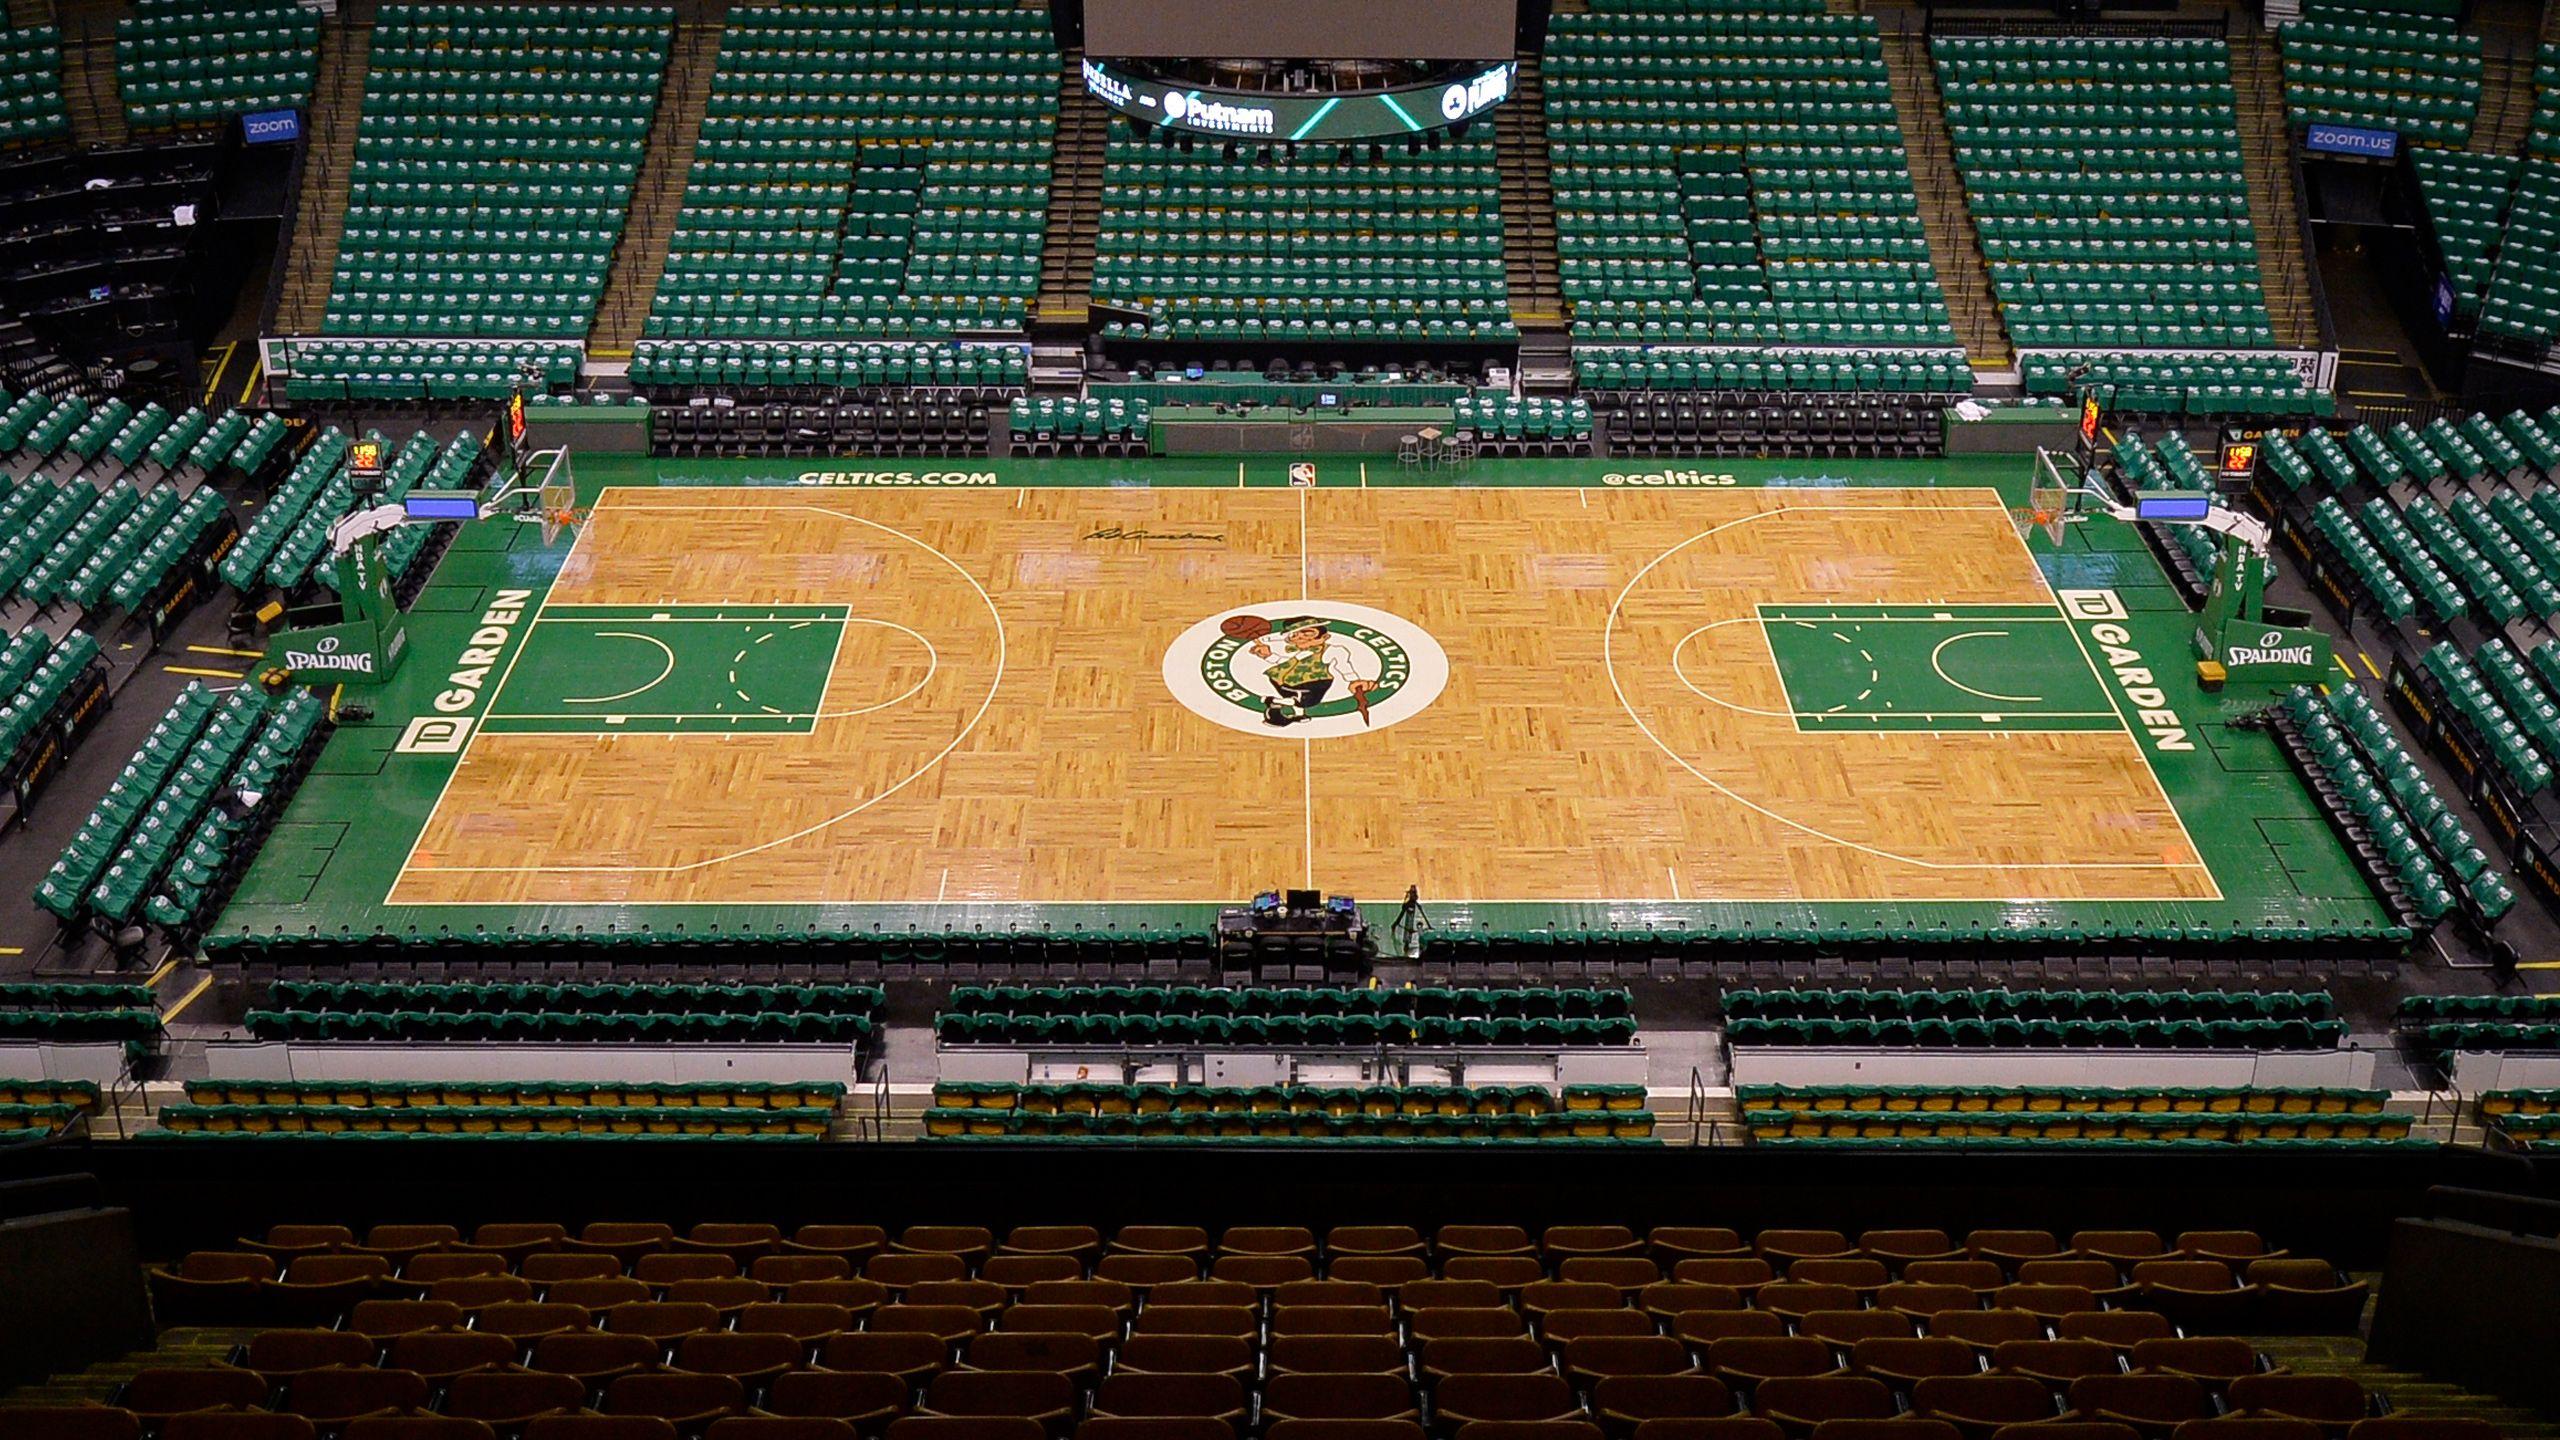 Above The Rim - Cleveland Cavaliers vs. Boston Celtics (Conference Finals, Game 5)